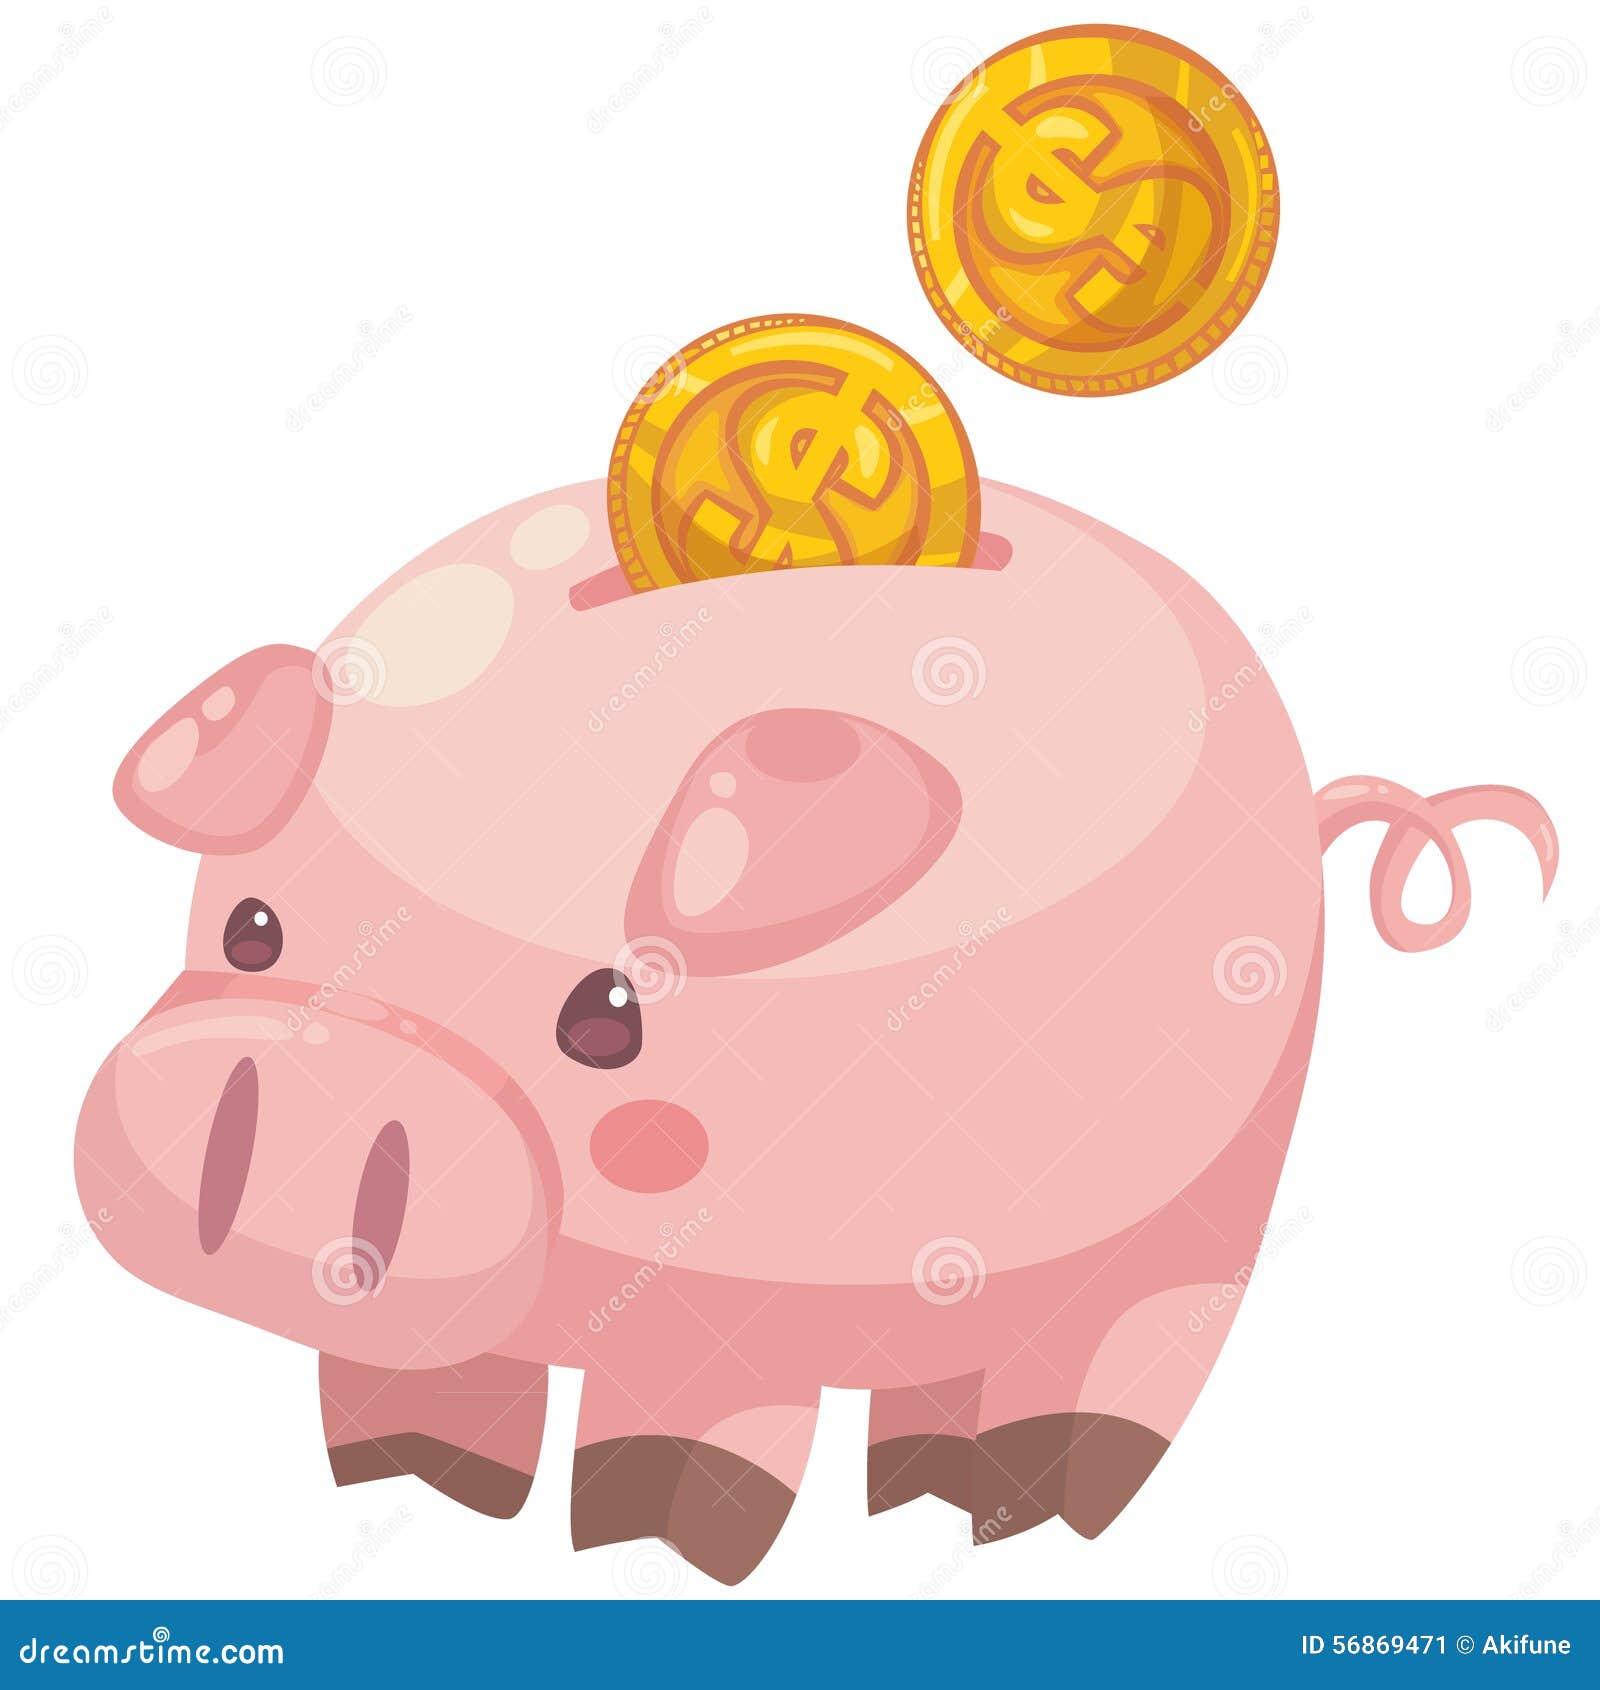 Cute Cartoon Piggy Bank With Coins Stock Vector